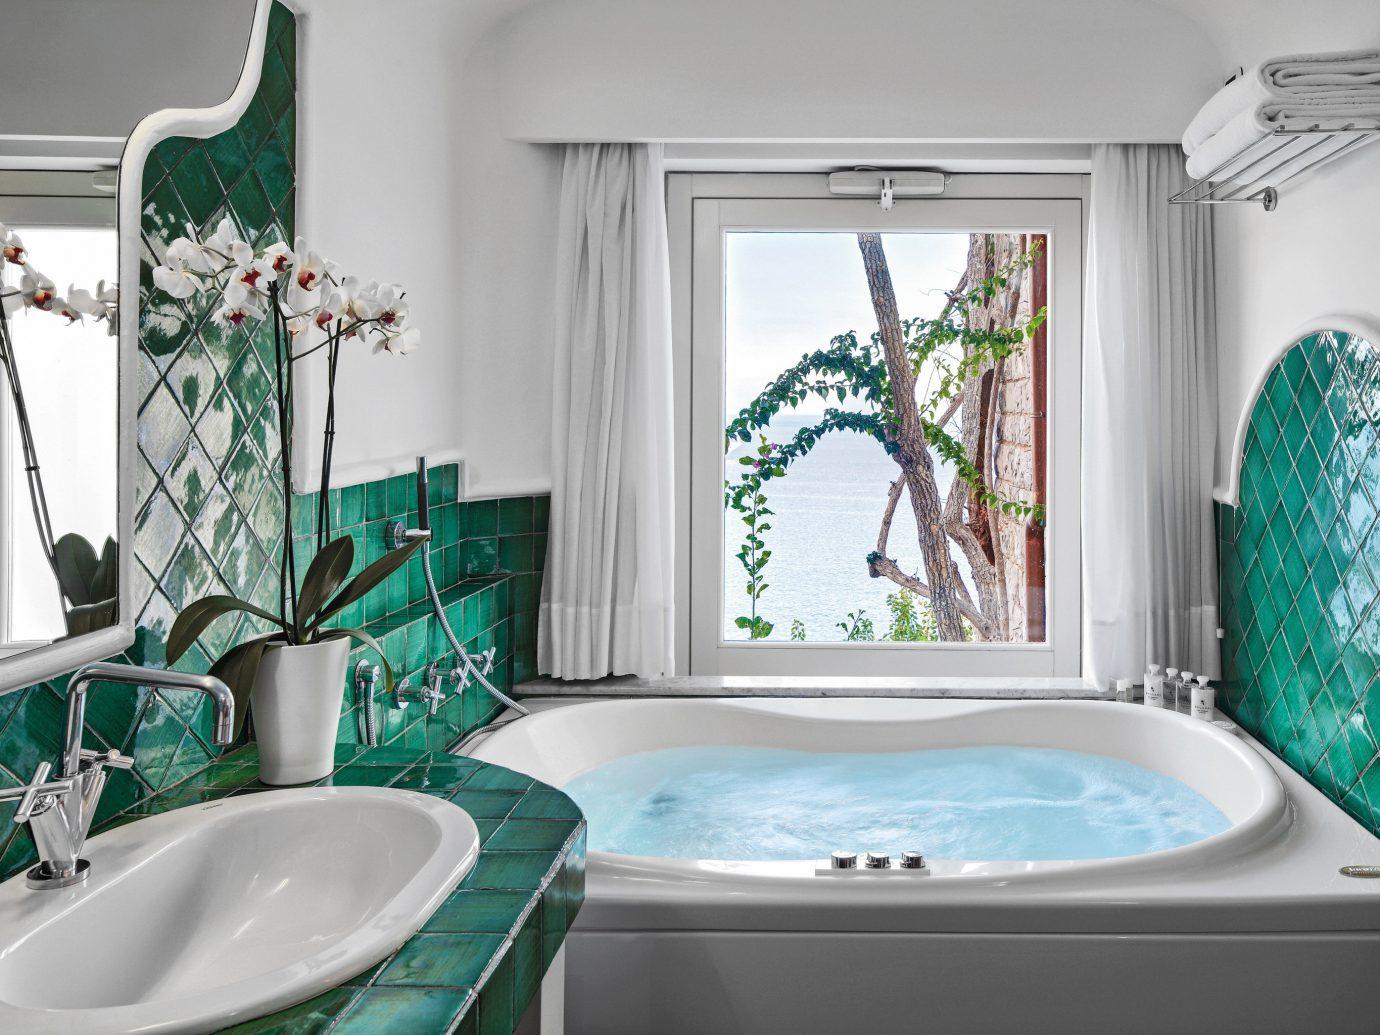 Honeymoon Hotels Luxury Travel Romance wall indoor bathroom room sink green tub bathtub interior design toilet swimming pool home plumbing fixture estate window Bath tiled